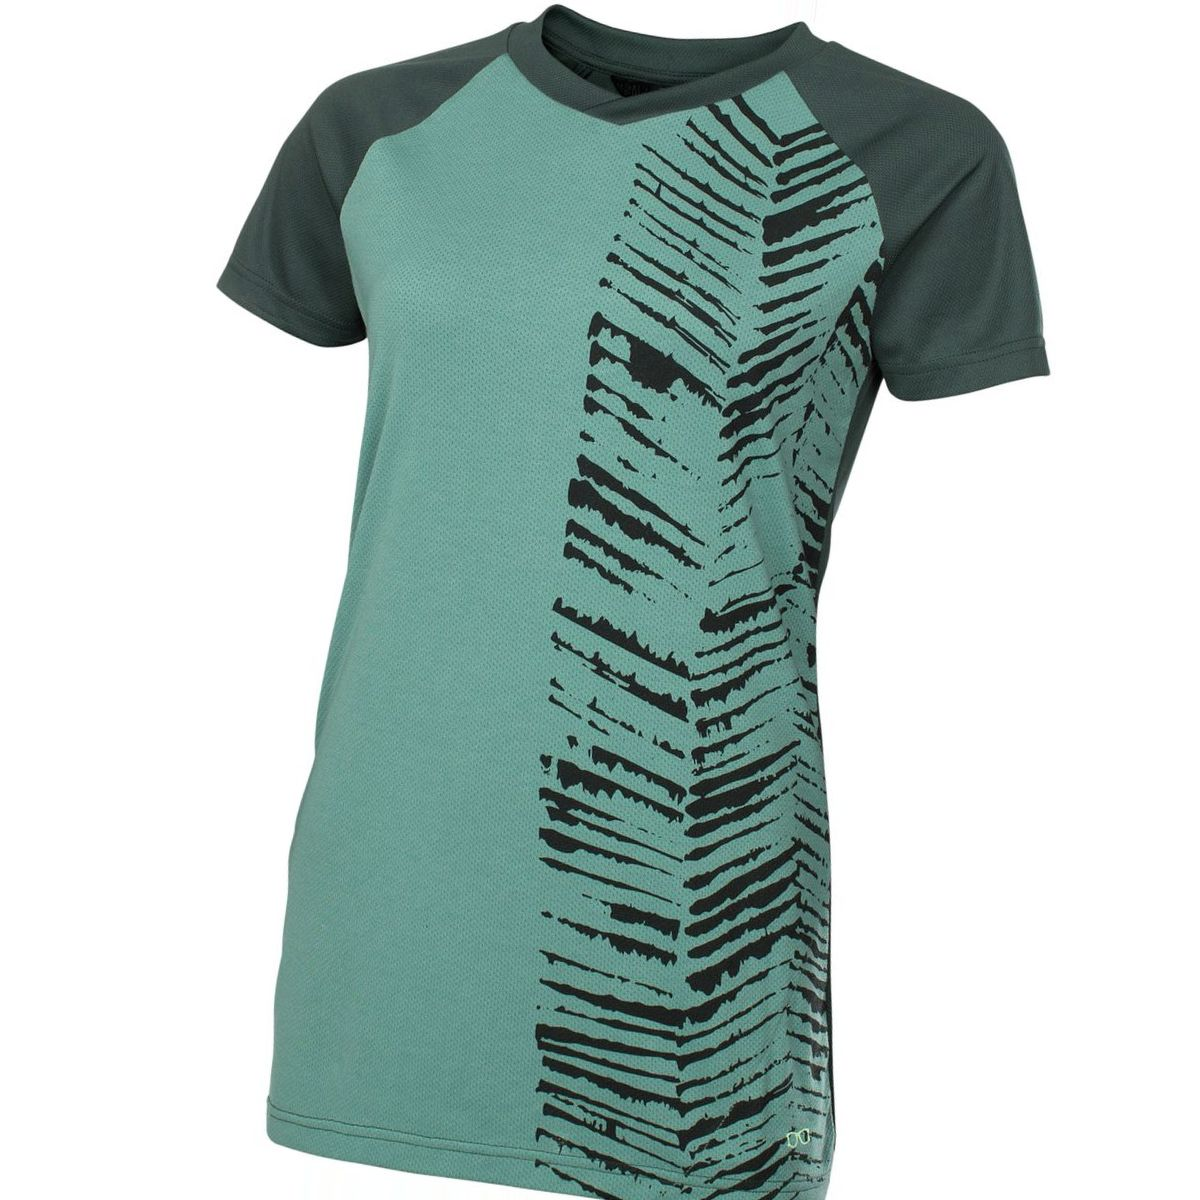 ION Scrub AMP Short-Sleeve Jersey - Women's